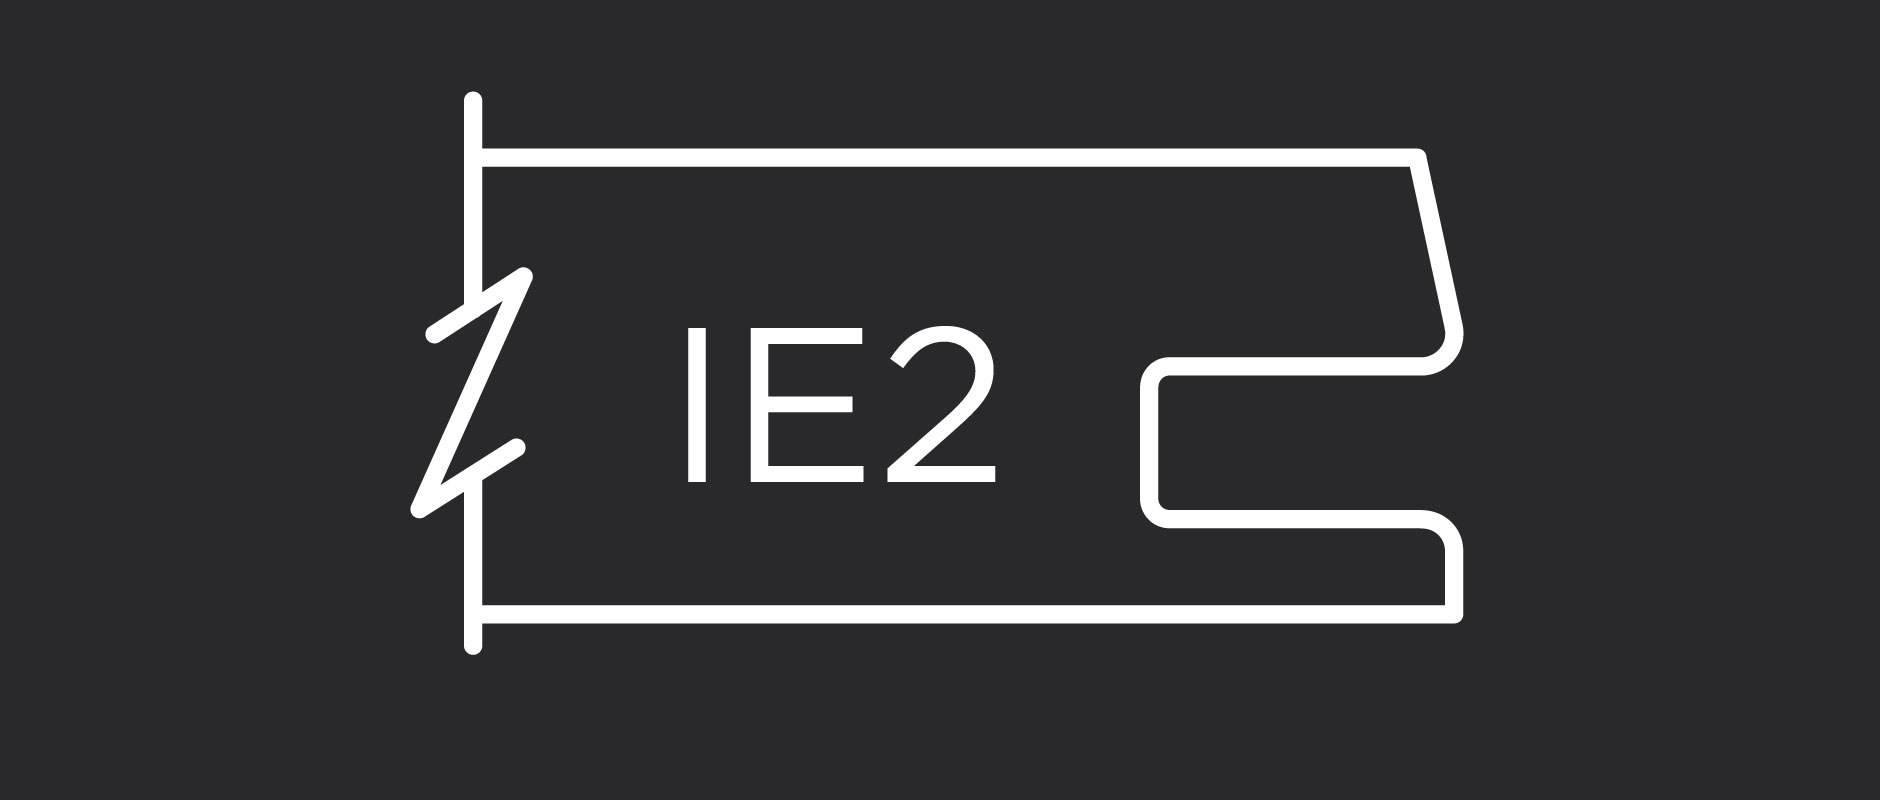 IE2 Inside Edge Profile